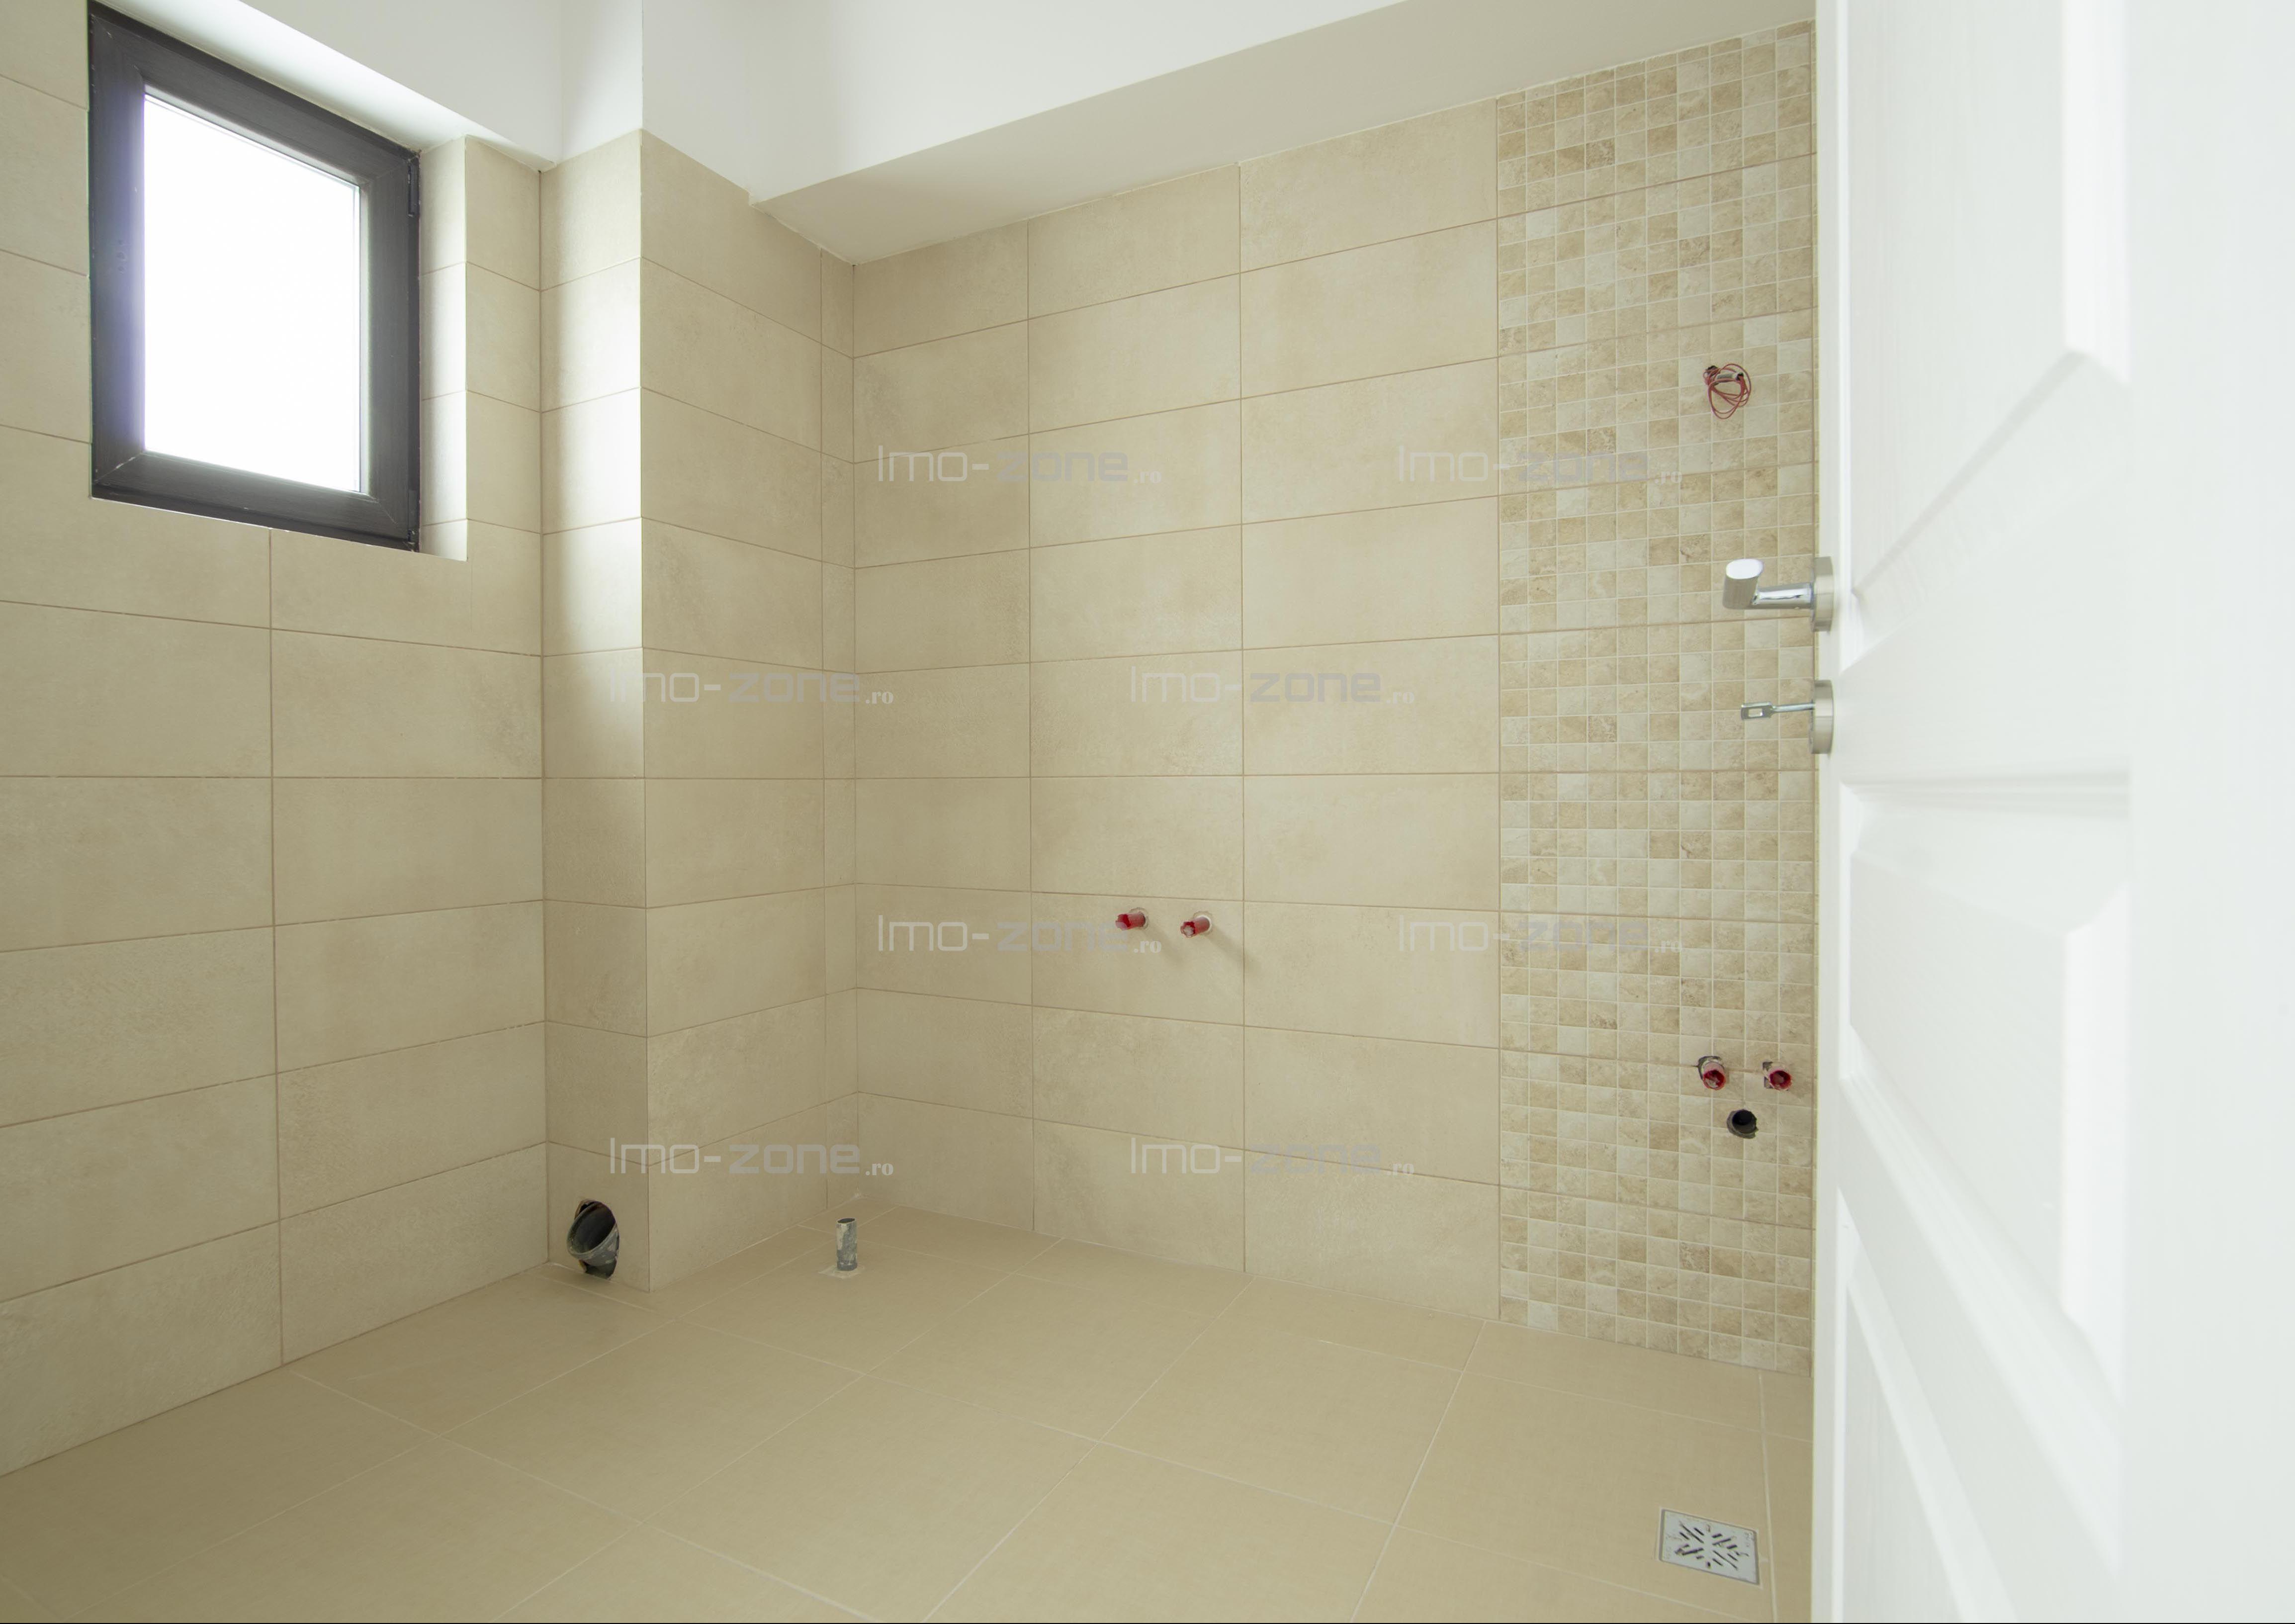 Apartament 3 camere + terasa, Drumul Taberei - Prel. Gh /Funigeilor, comision 0%